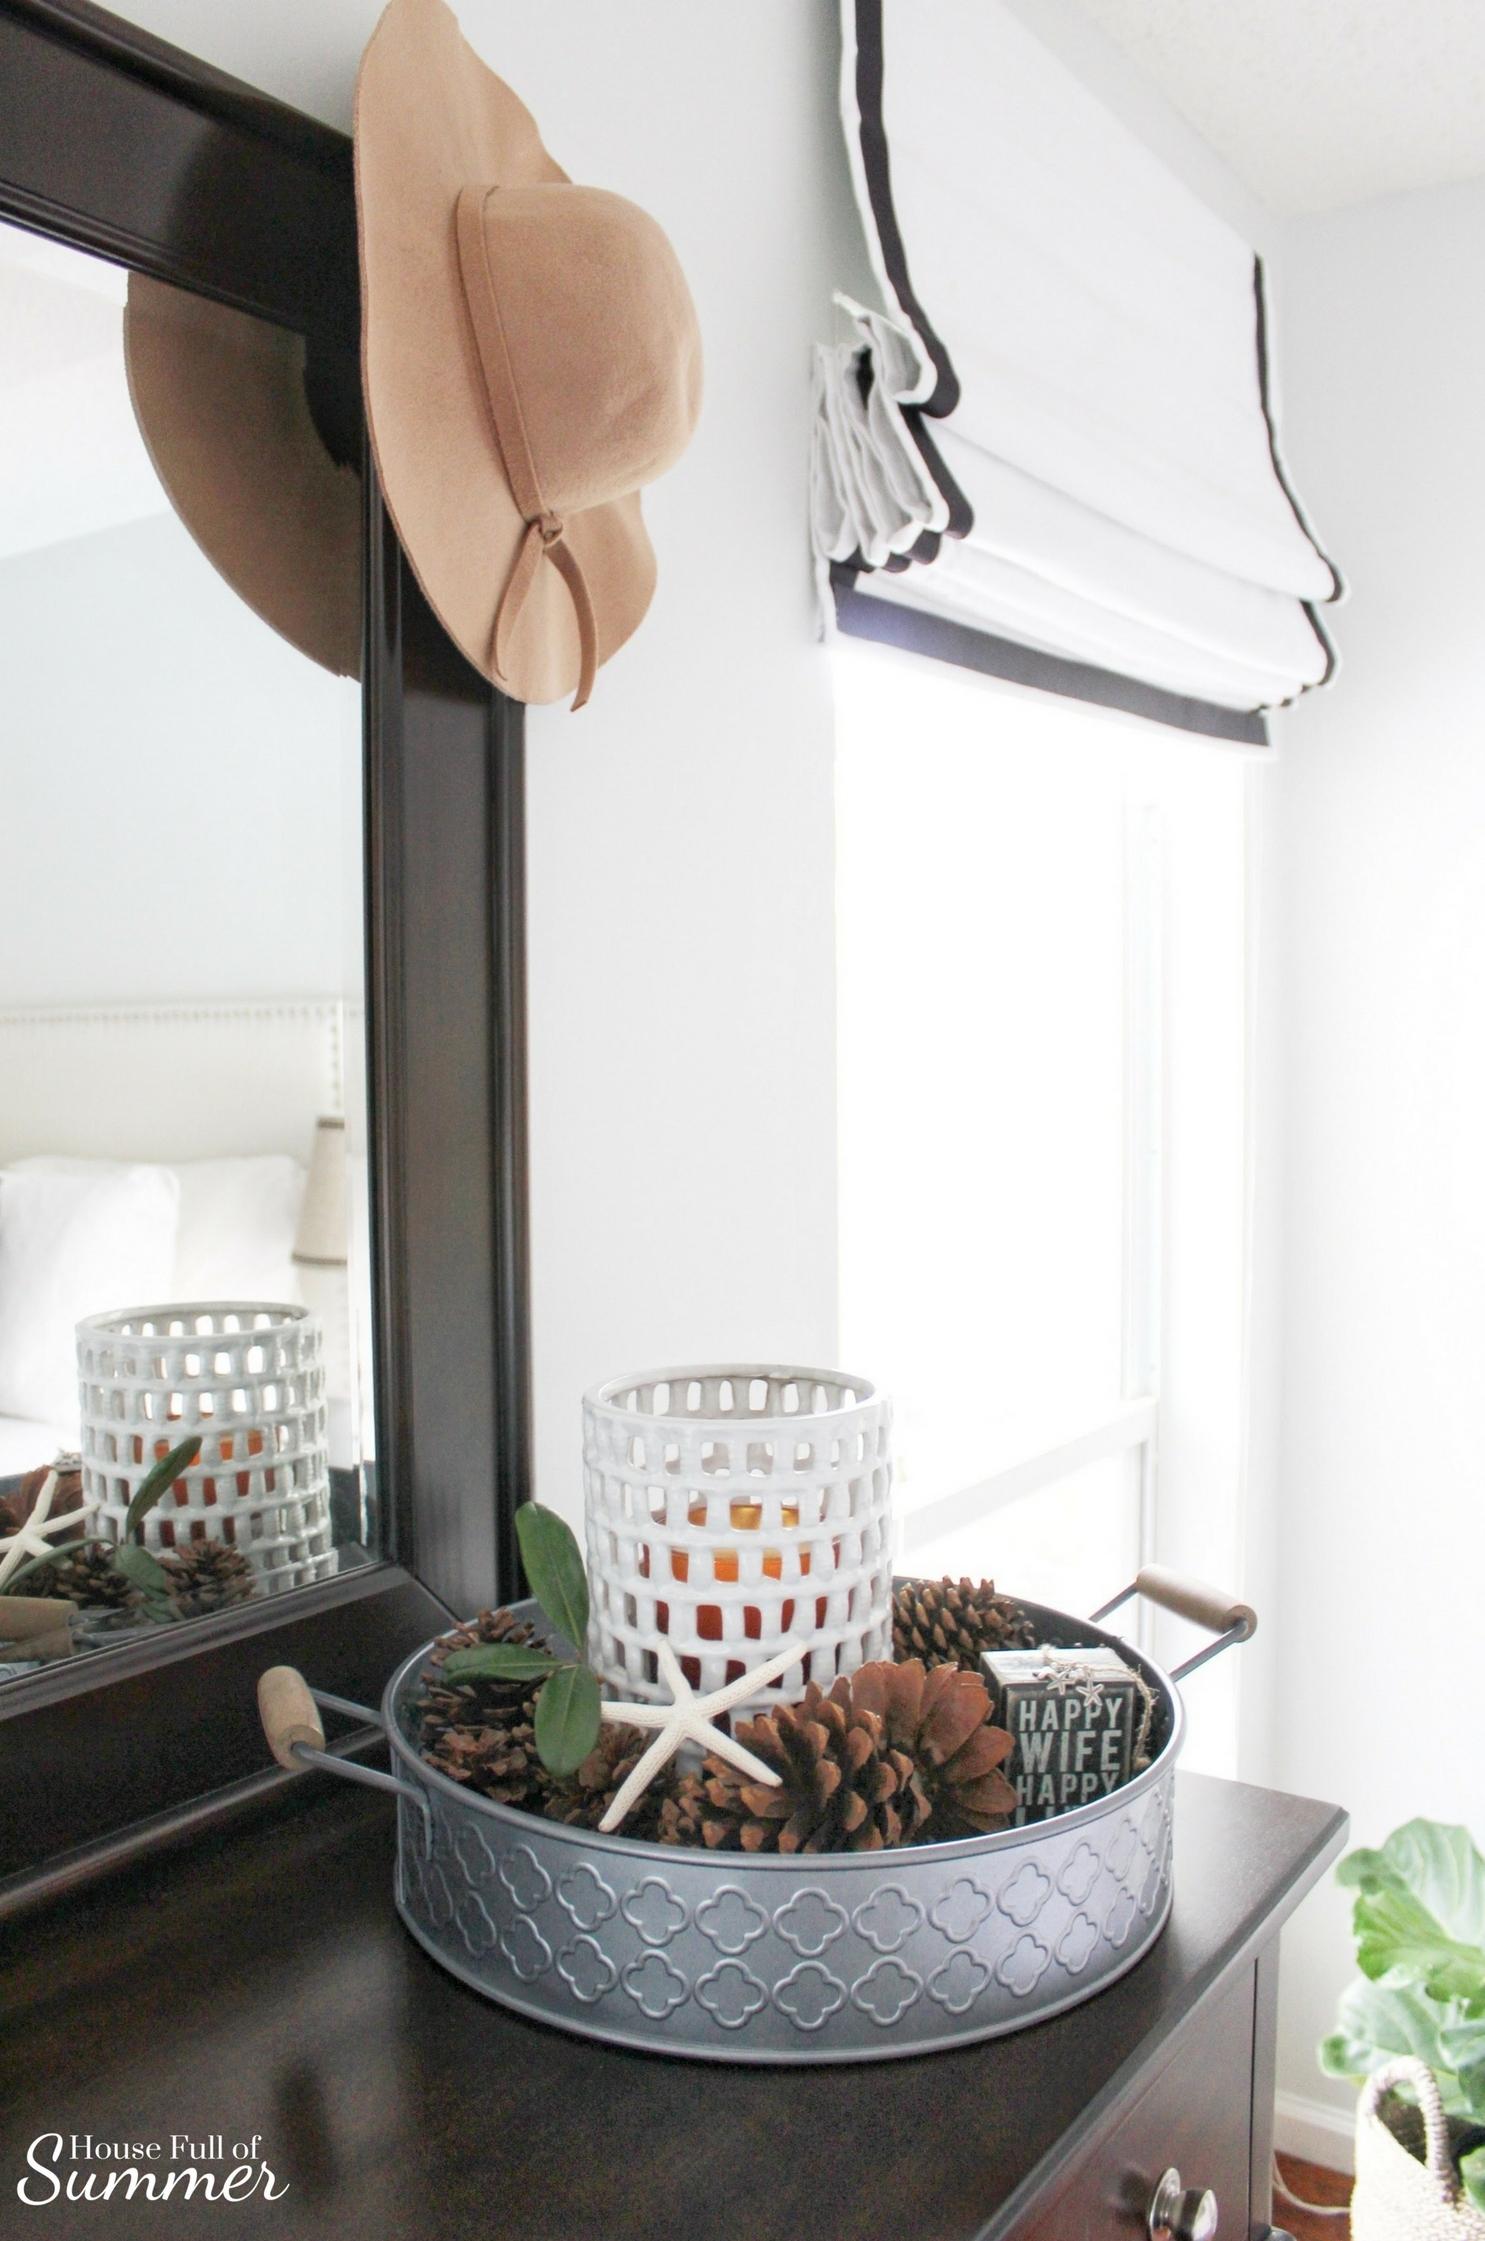 House Full of Summer: Fall Home Tour Blog Hop - Cozy, Coastal, Chic Master Bedroom decor, decorating on a budget,, fall decor ideas, coastal bedroom ideas, tray styling, diy fall decor, roman shades, pottery barn style